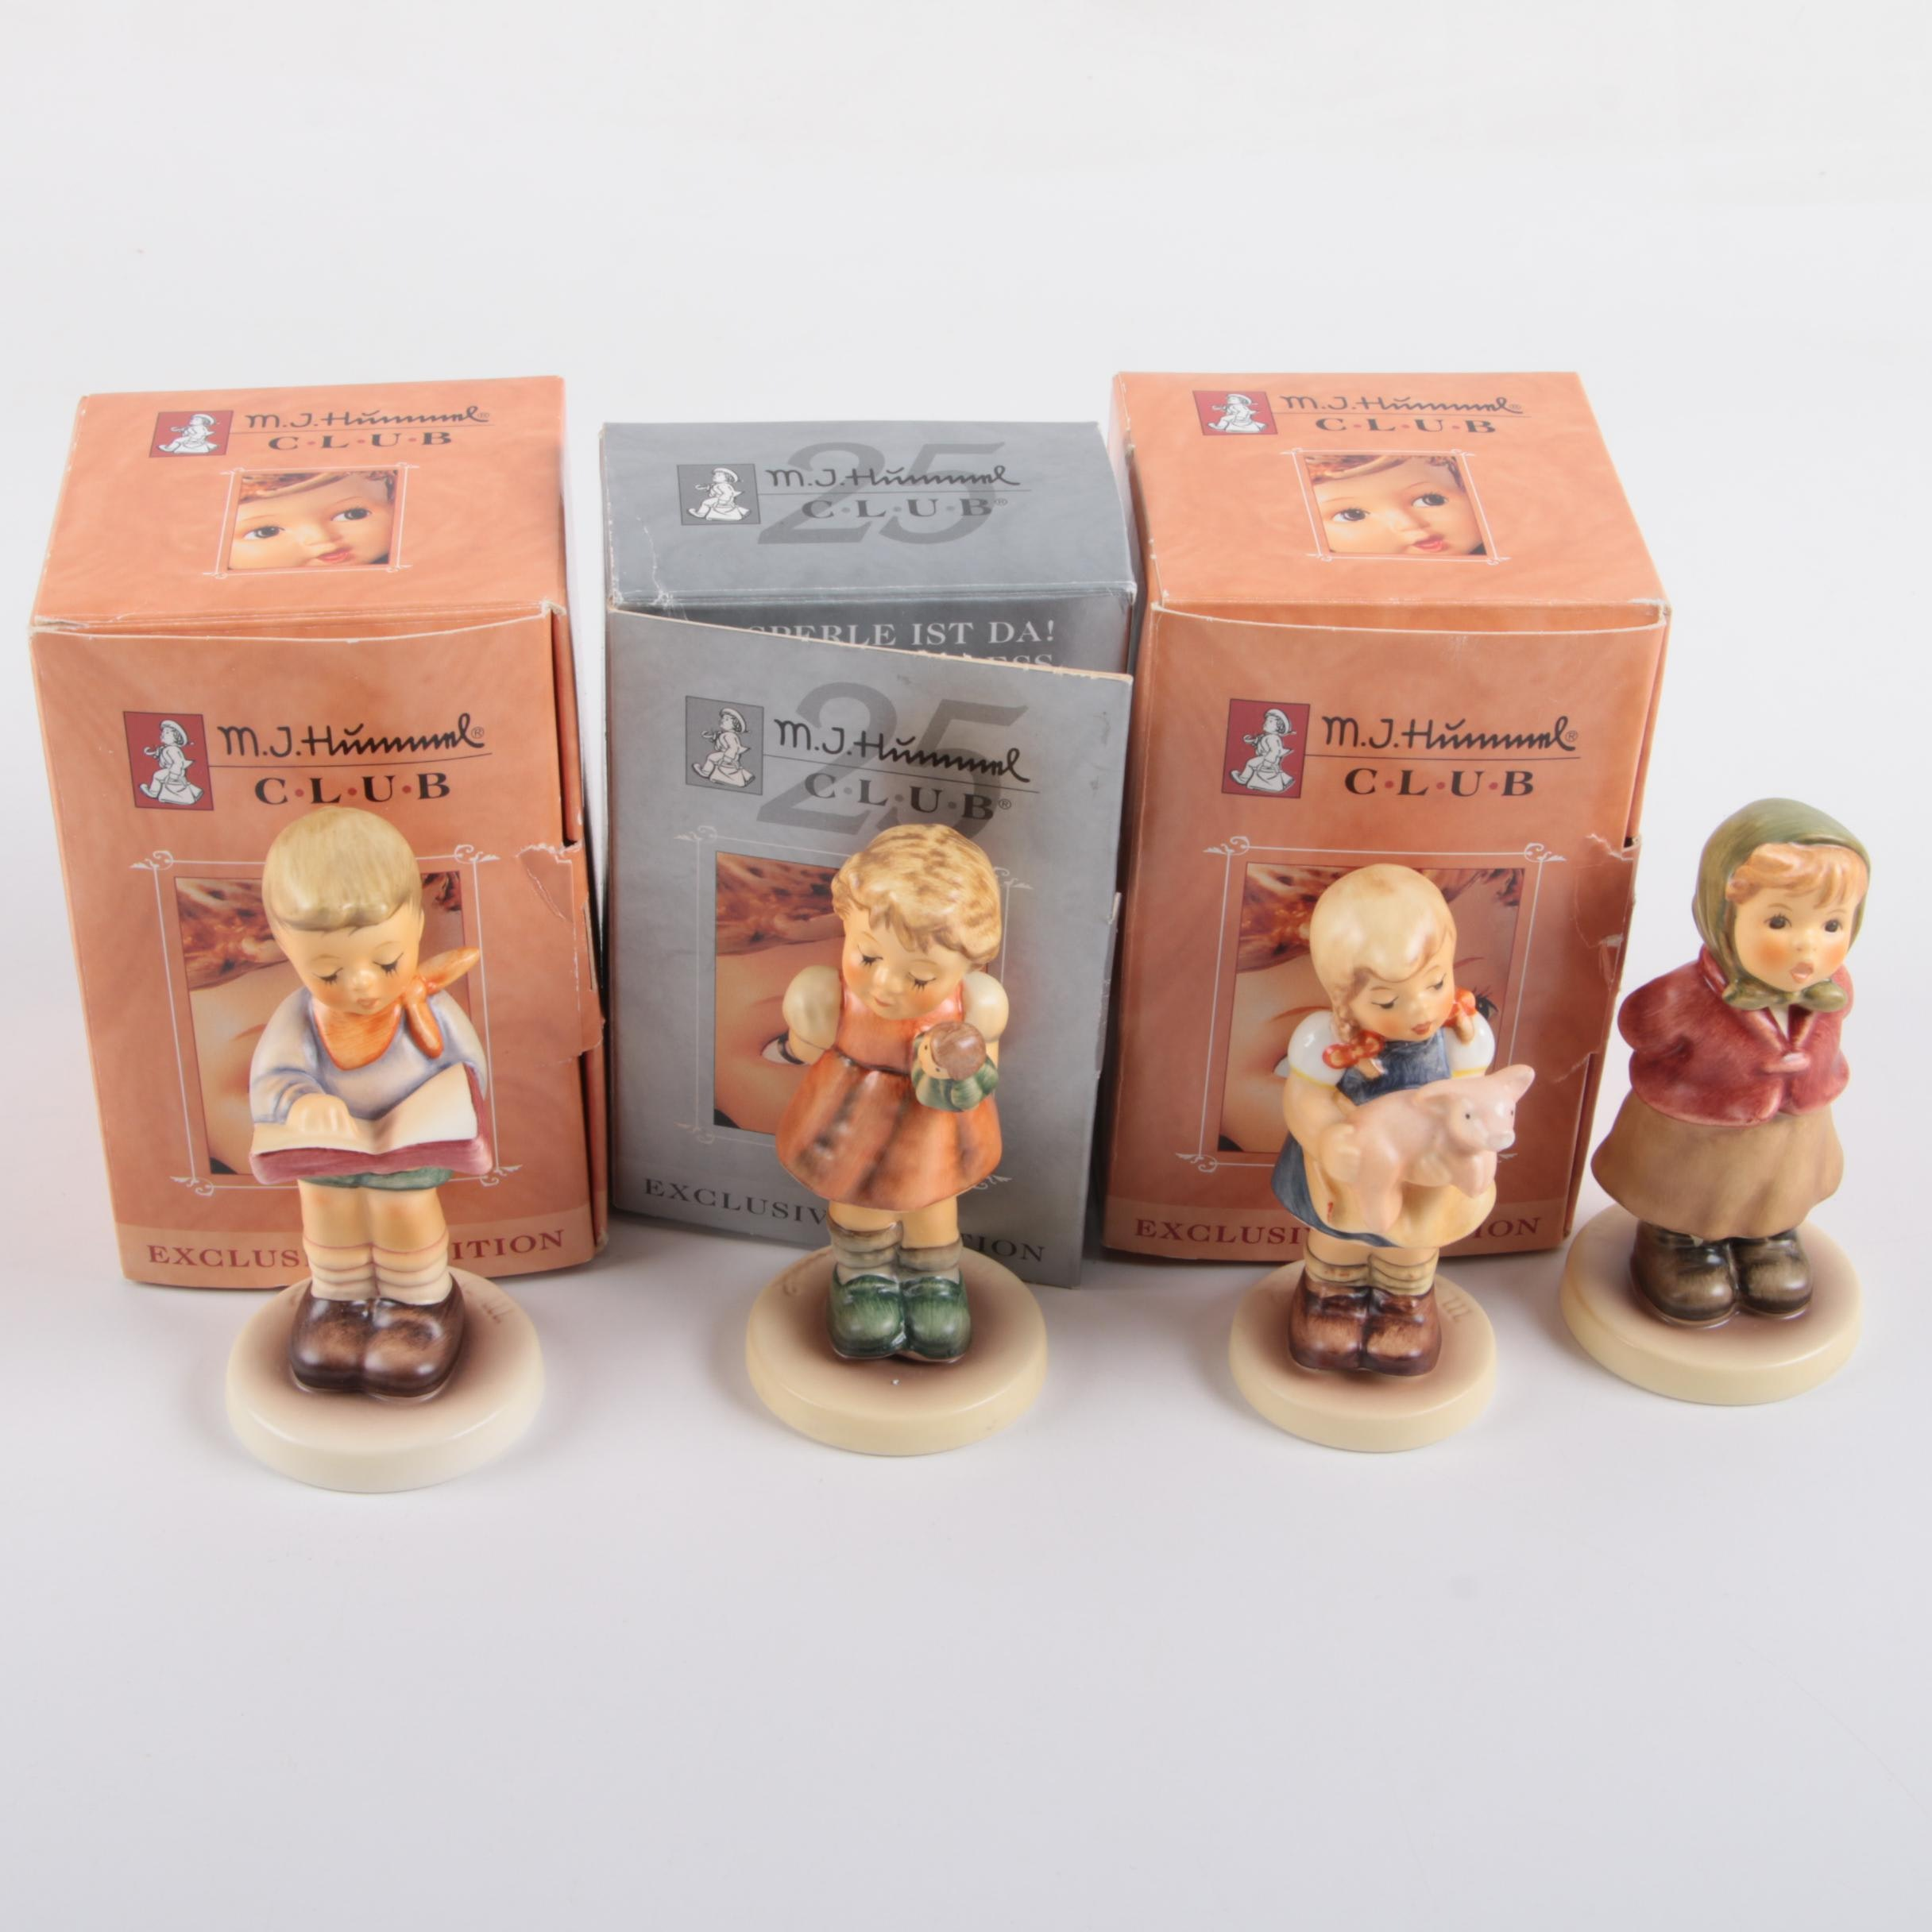 M.I. Hummel Club Membership Year 1999 - 2005 Porcelain Figurines